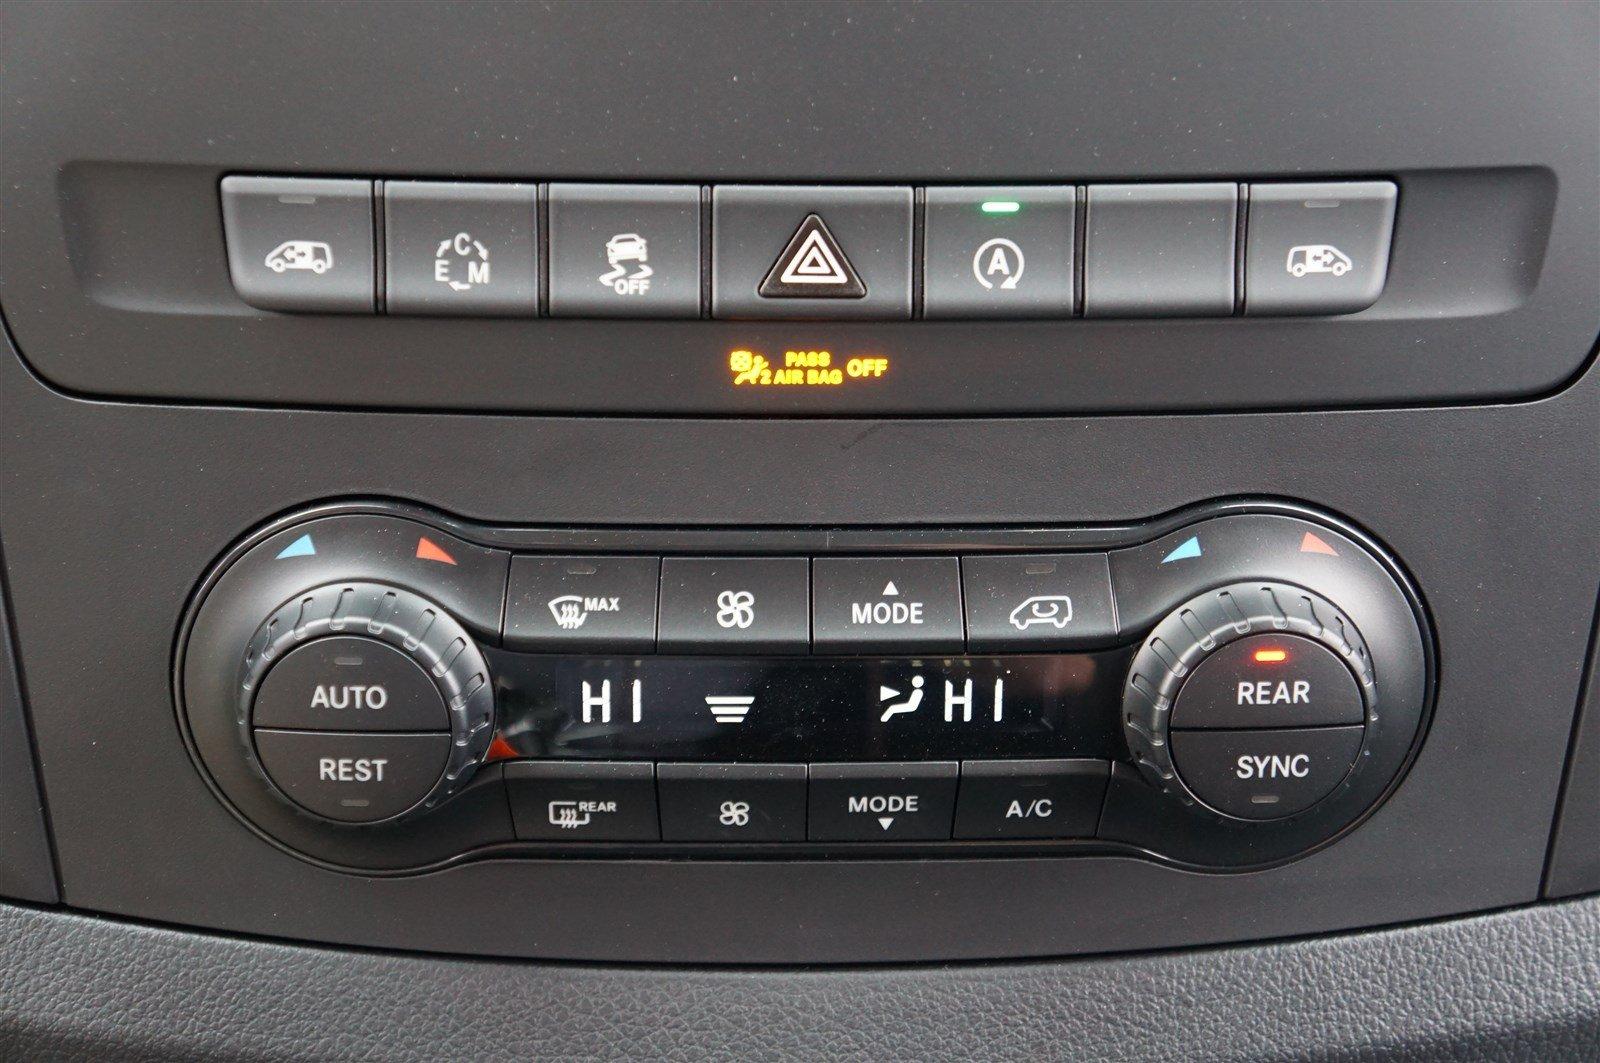 Mercedes C300 Rattling Noise